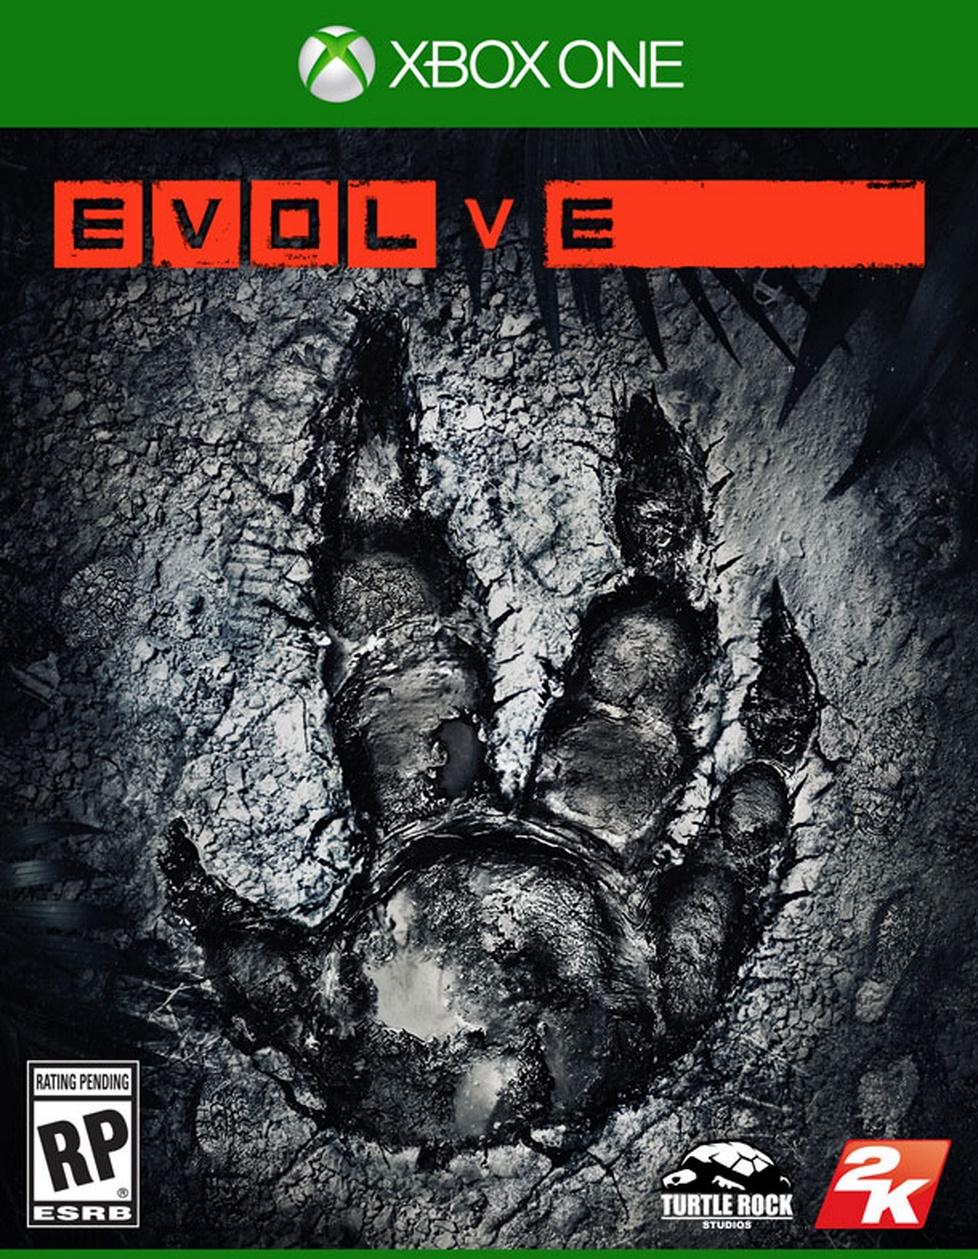 Juega Evolve Xbox One y Pc Gratis este fin de semana